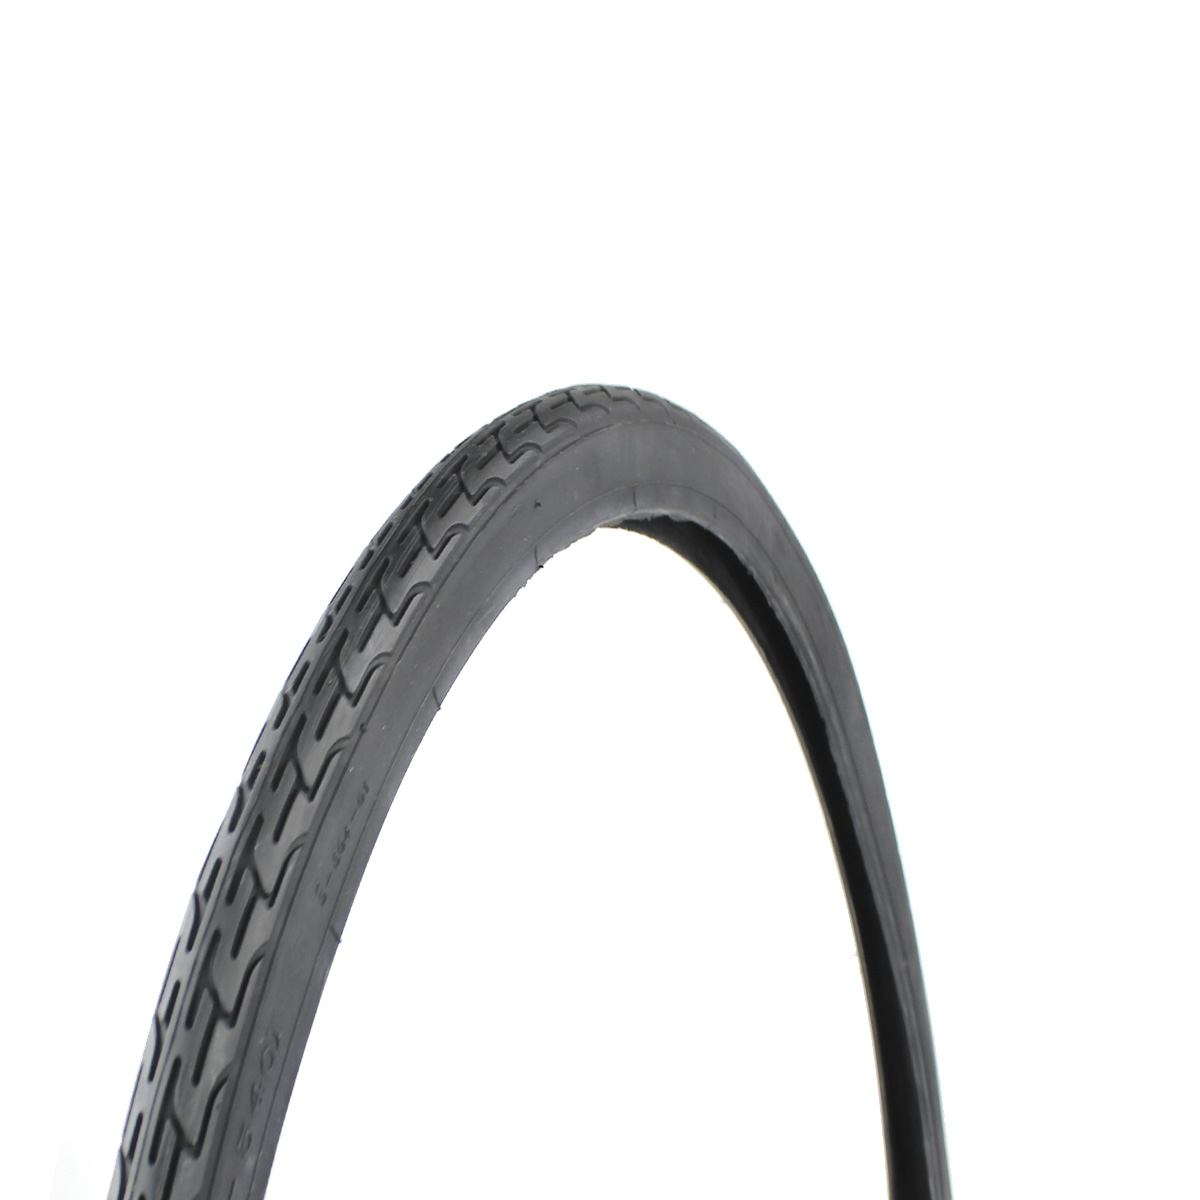 Pneu Deli Tire 24 x 1.3/8 S-604 TR Noir